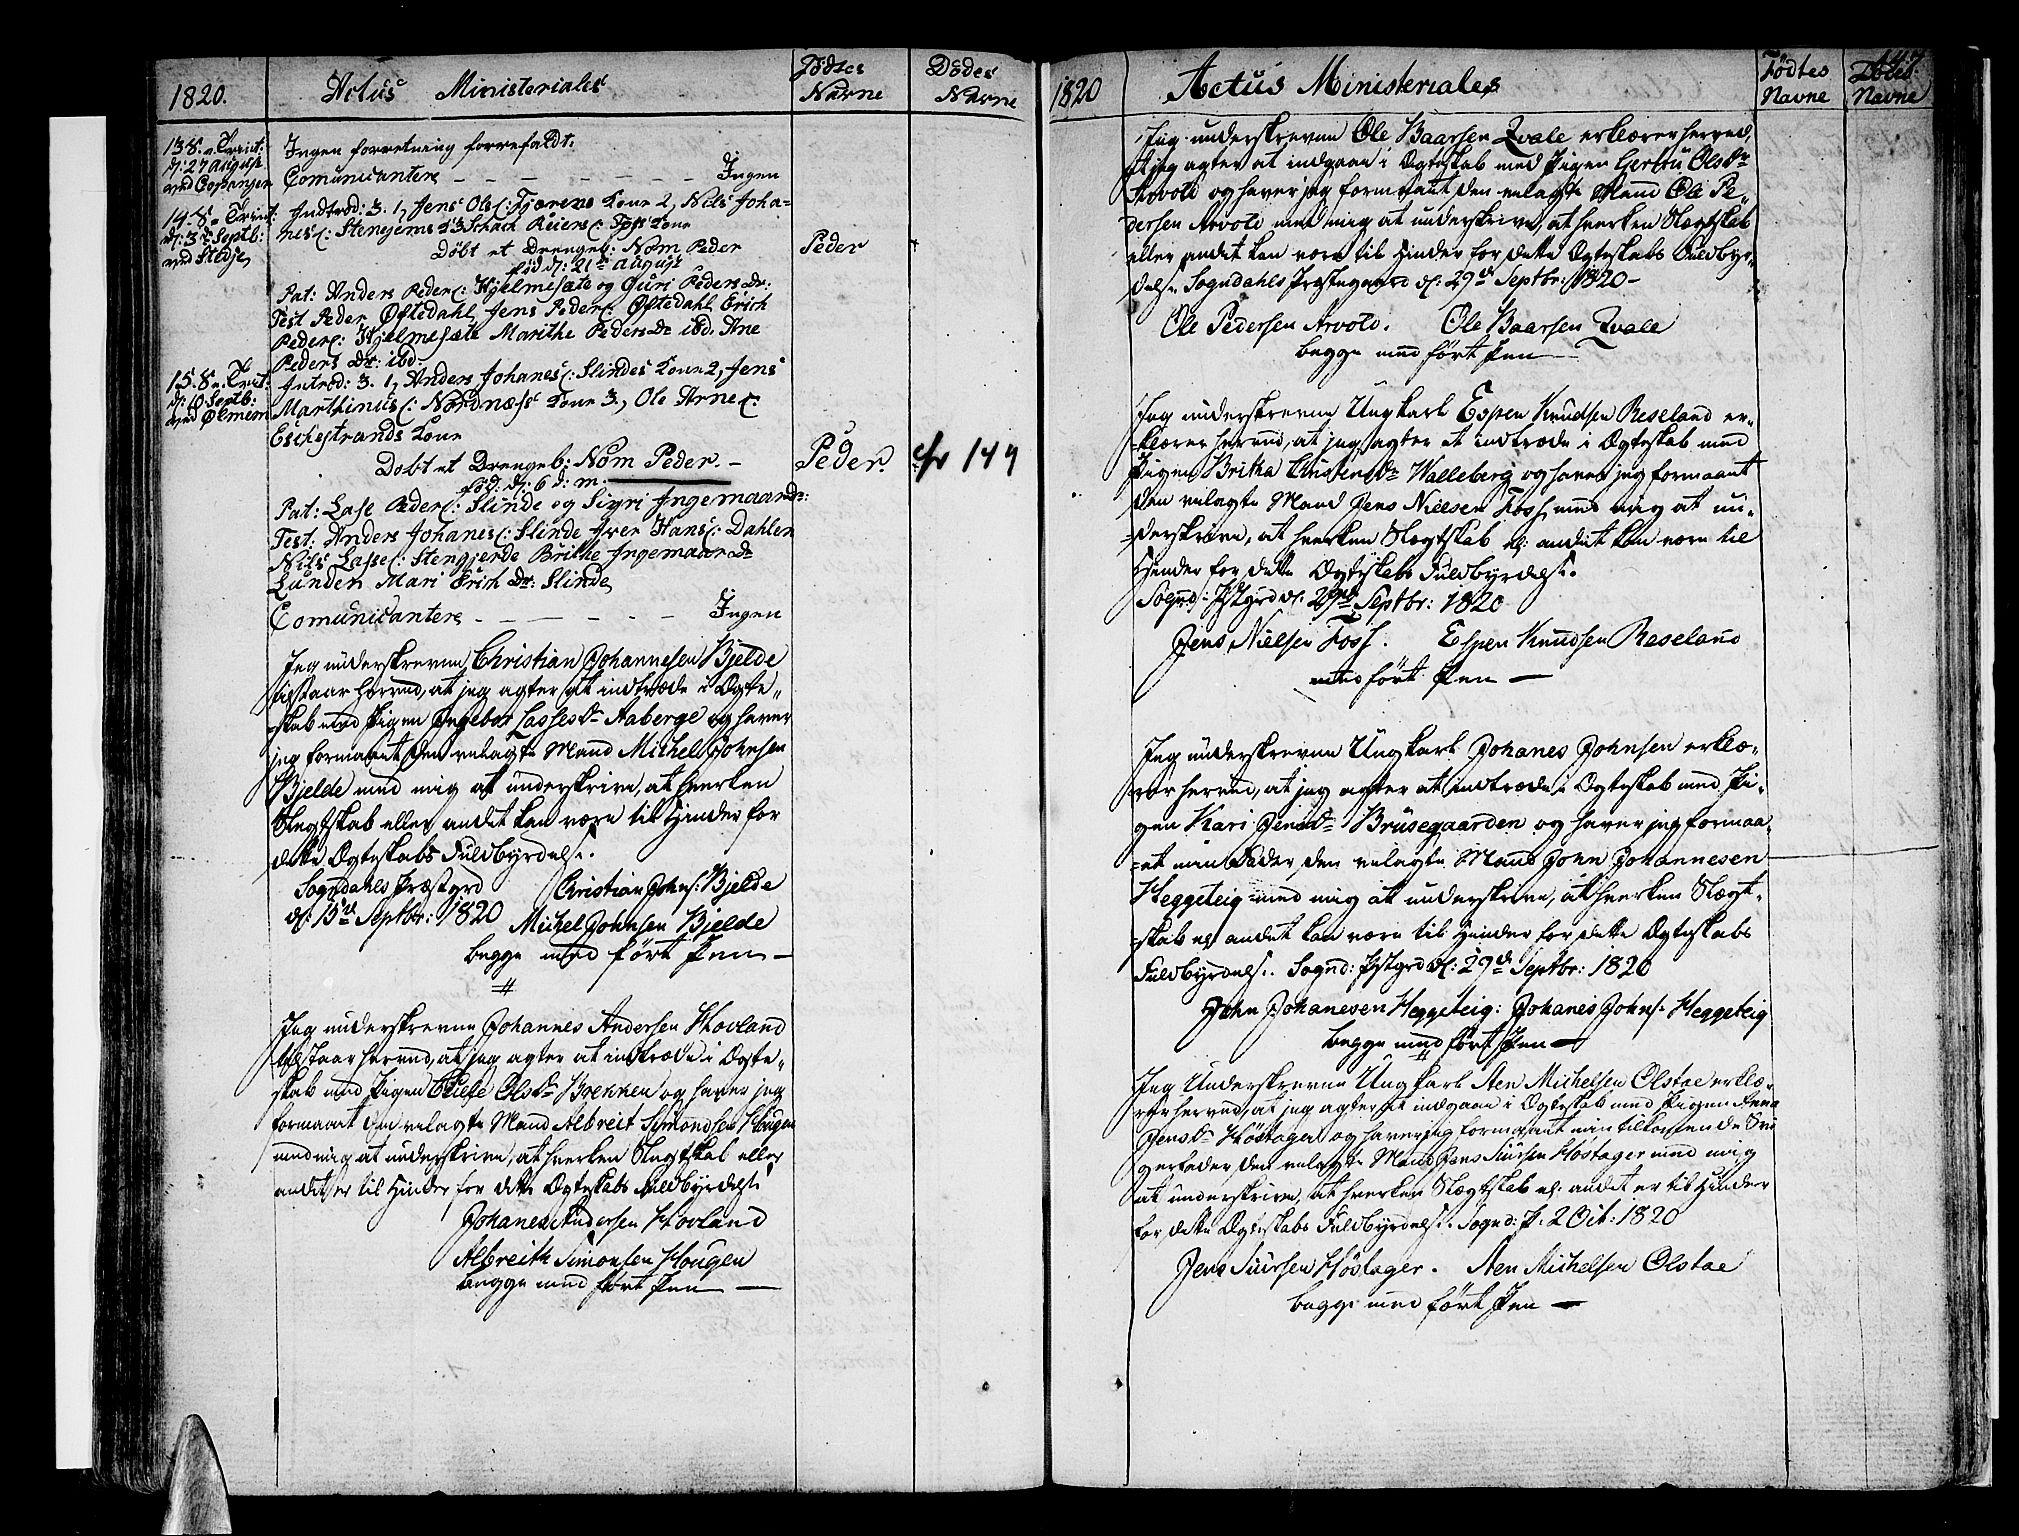 SAB, Sogndal sokneprestembete, H/Haa/Haaa/L0009: Ministerialbok nr. A 9, 1809-1821, s. 147